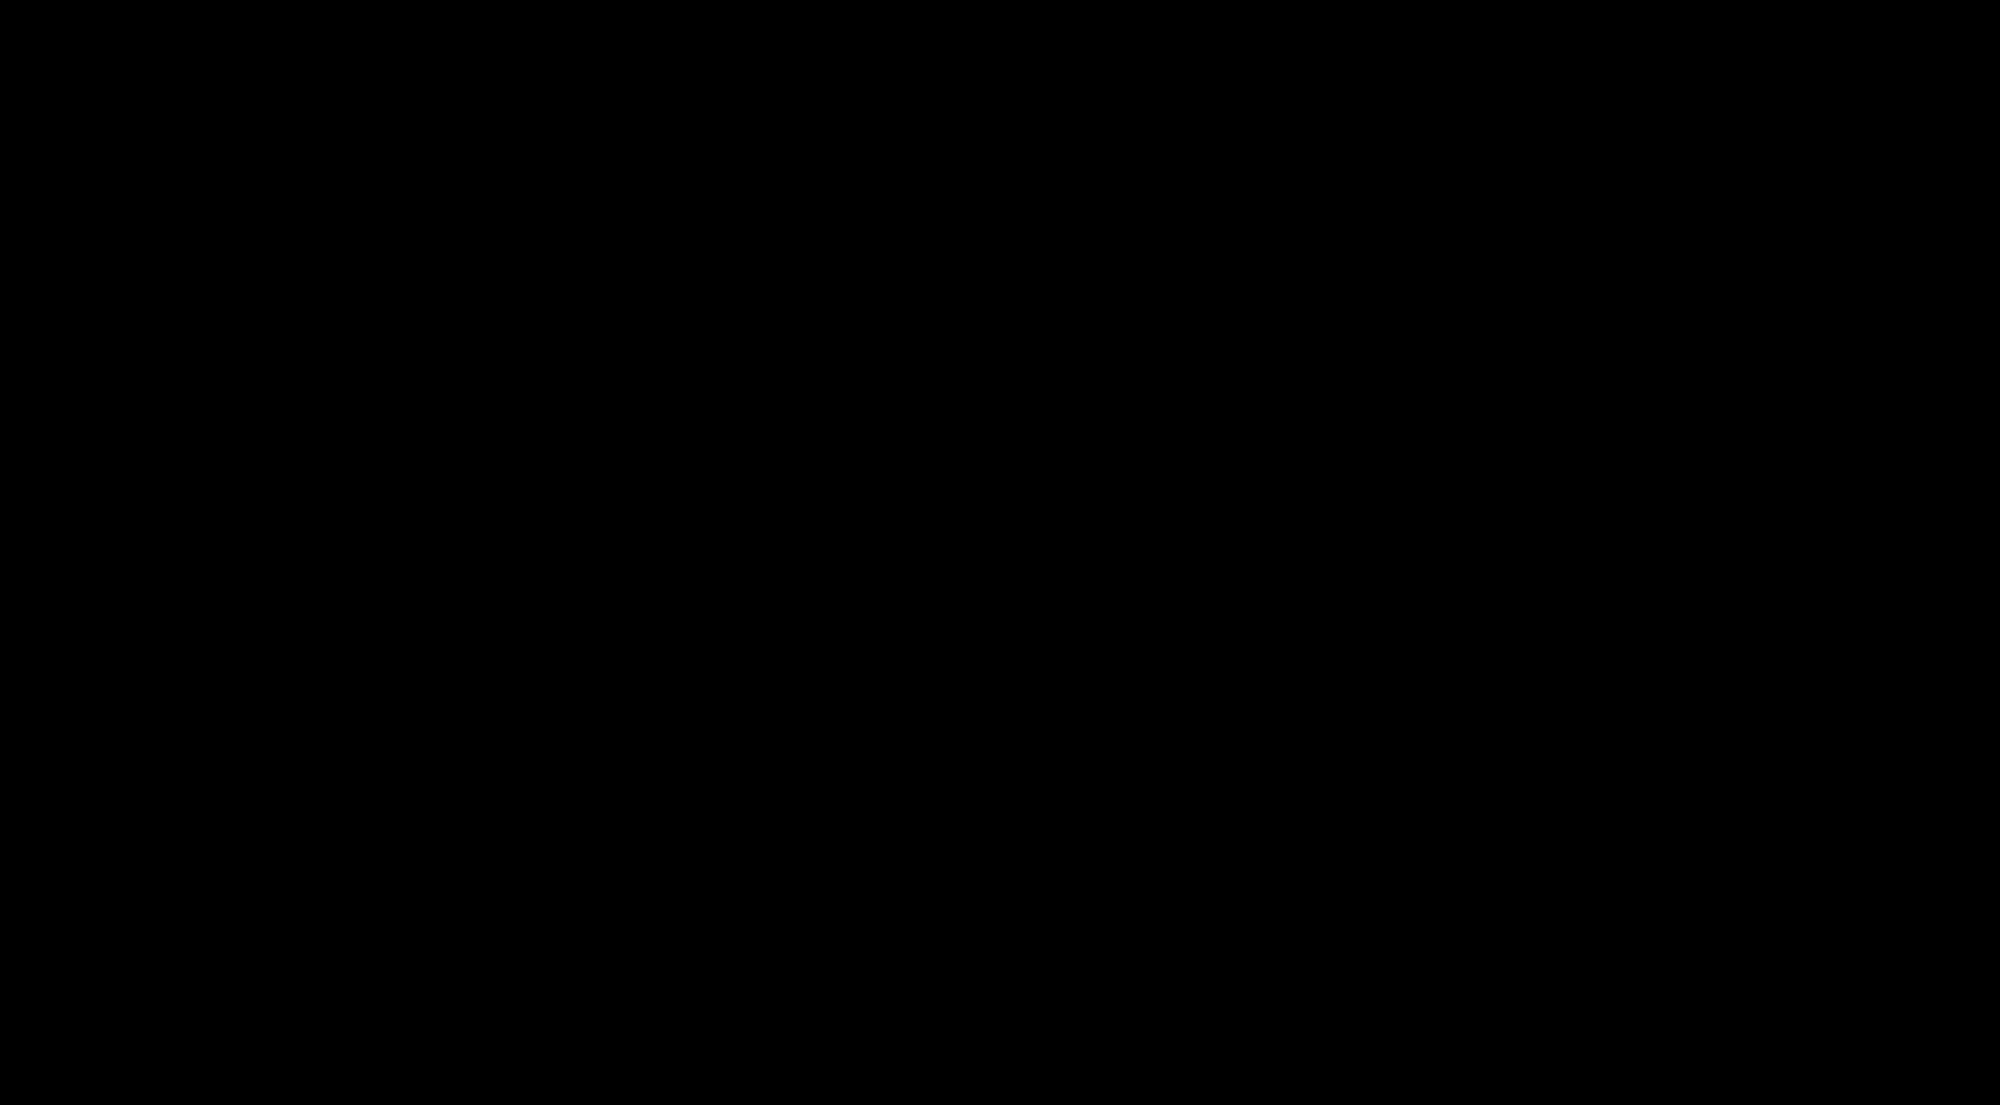 hht-logo-black.png